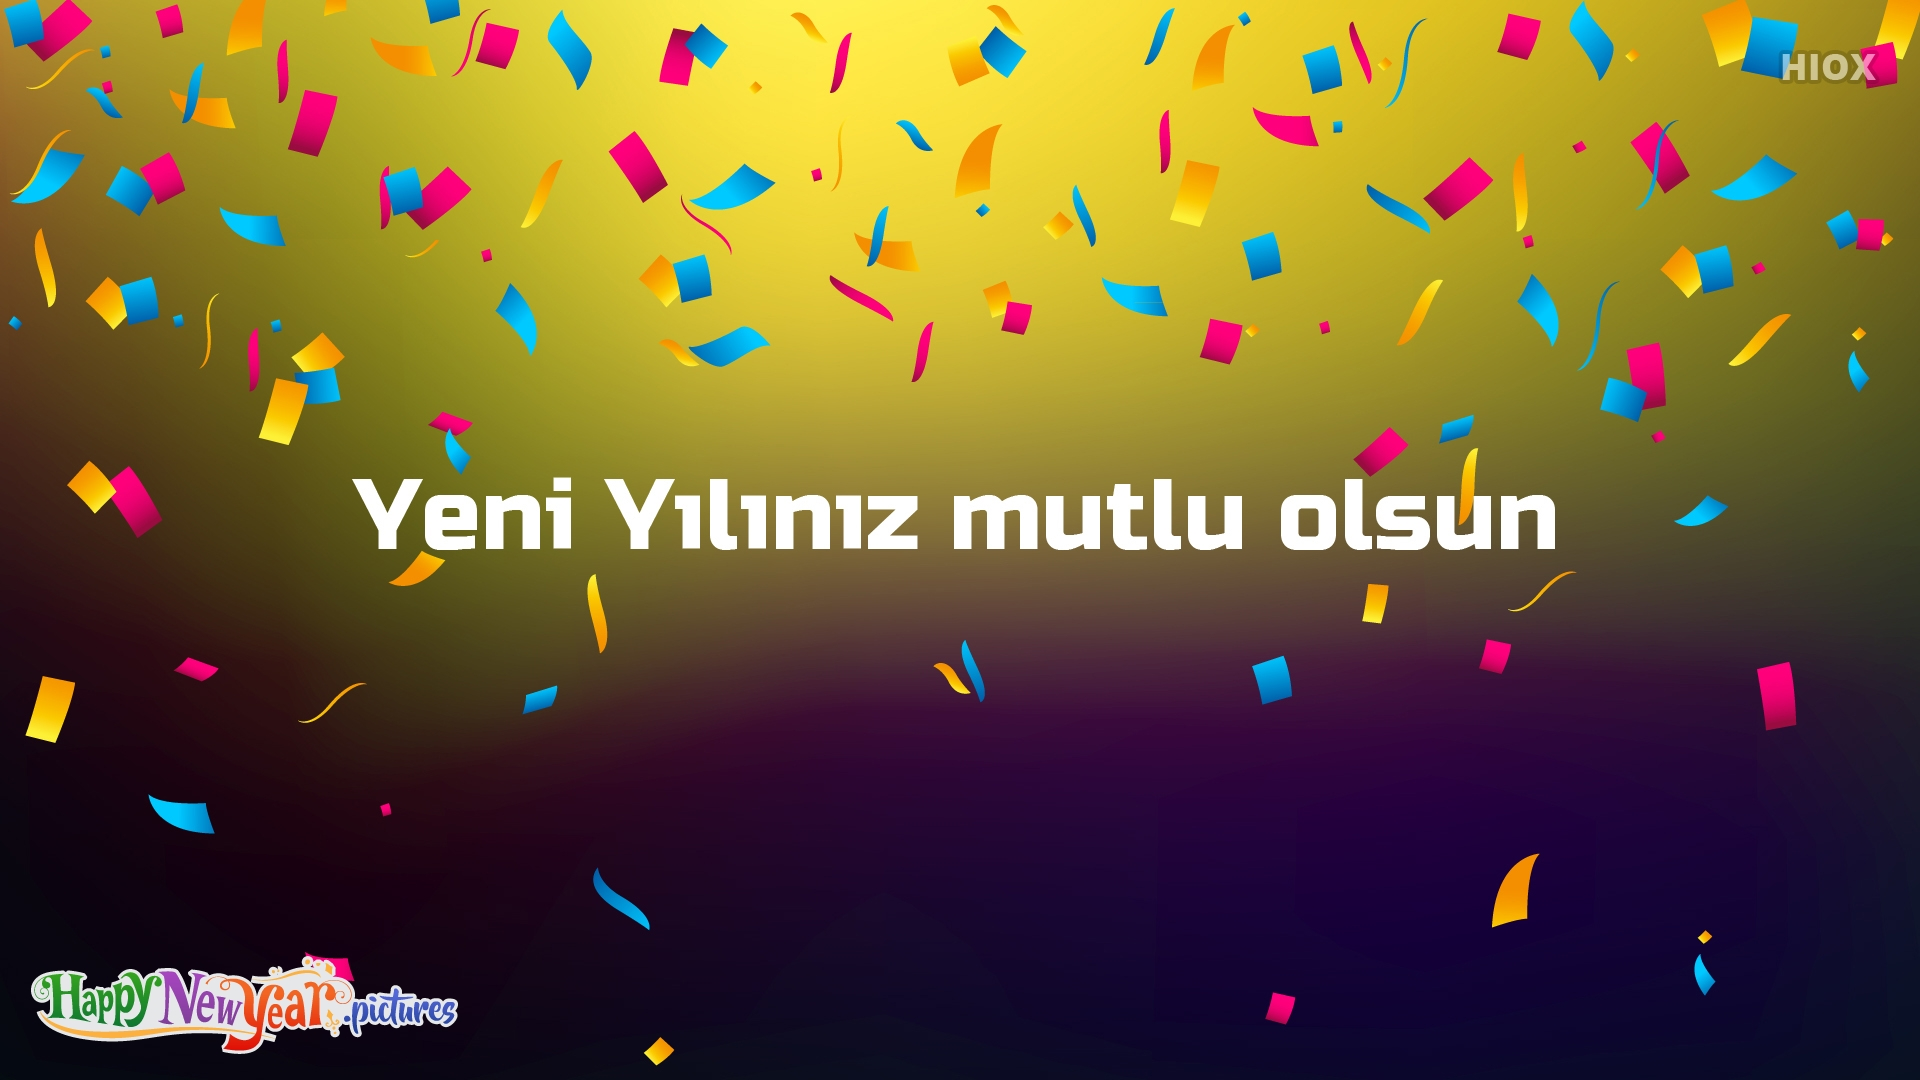 Cheerful Happy New Year Wishes In Turkish